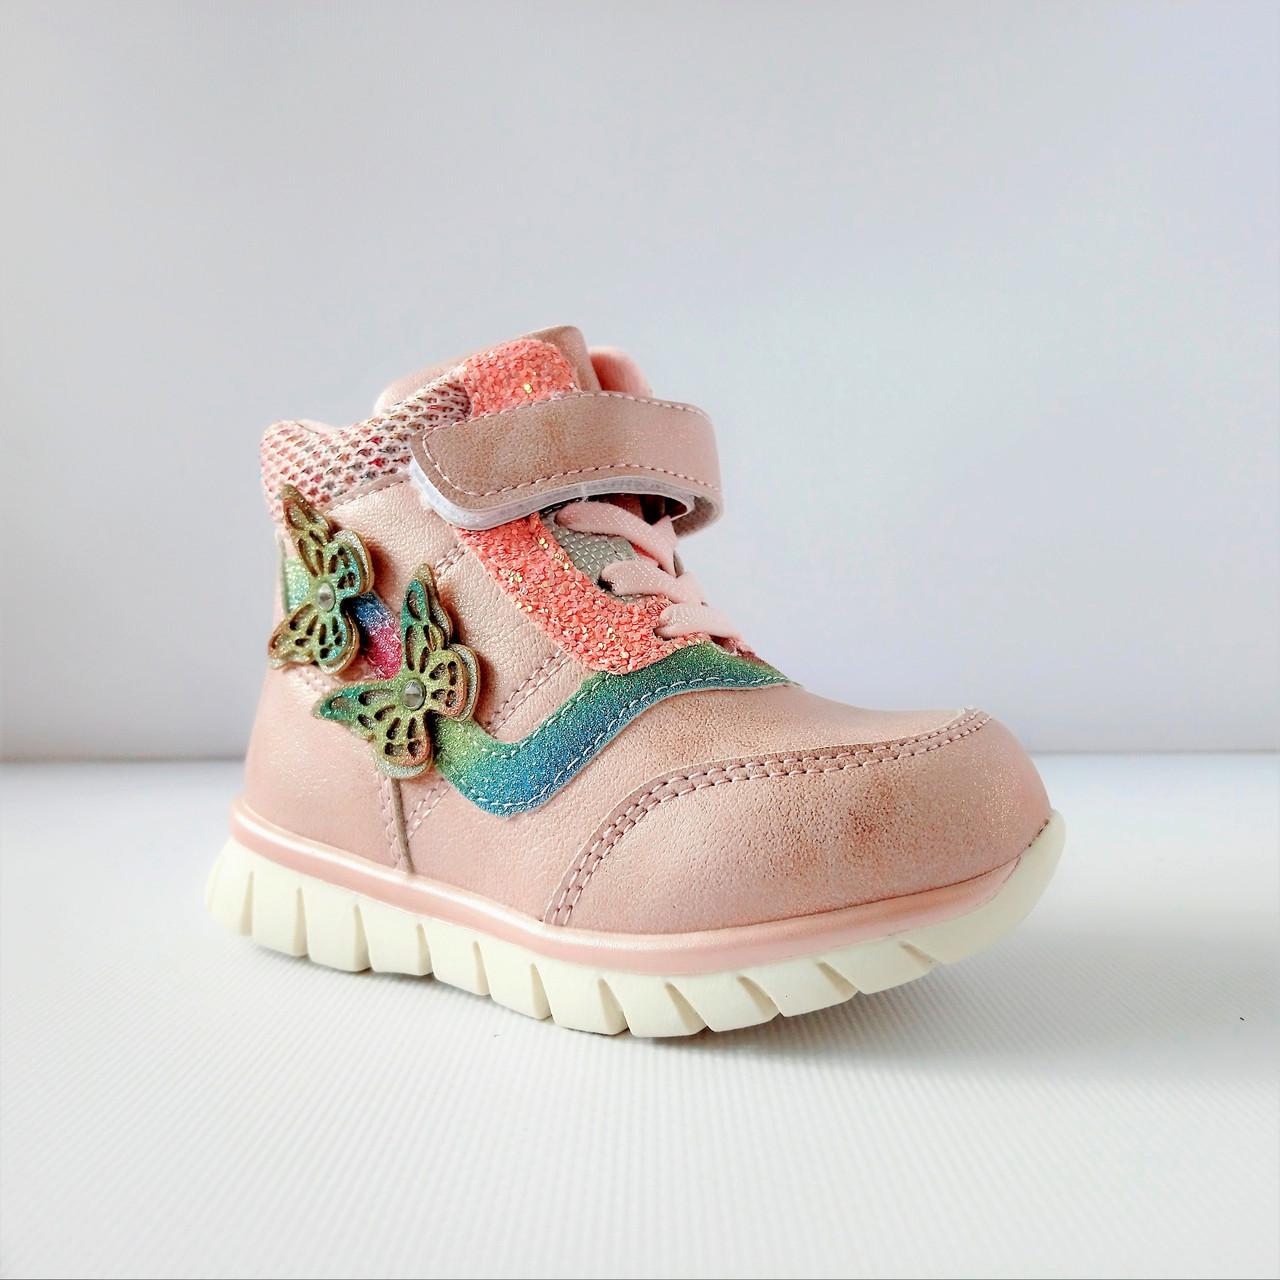 Теплые деми ботинки девочкам, р. 23, 24,  26, 27, 28